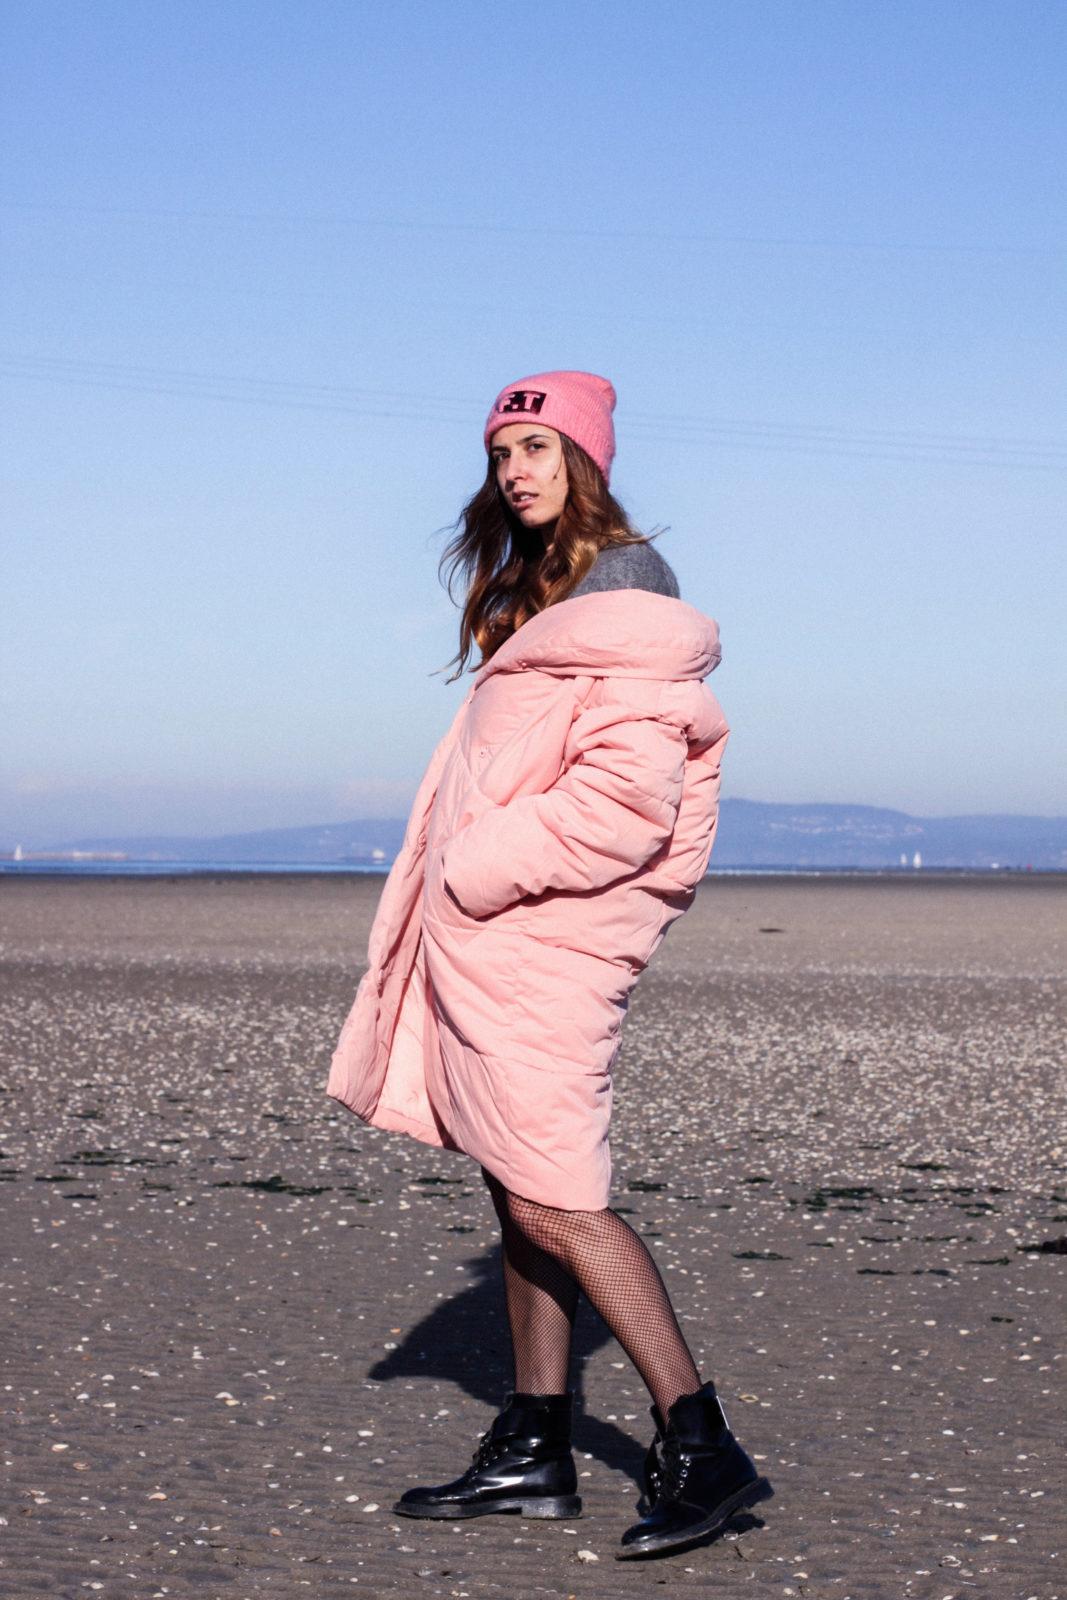 retailmenot-cupones-descuentos-asos-plumifero_rosa-monki-puffer_coat-gorro-beanie-medias_de_rejilla-look-outfit-tendencias-fall-2016-street_style-donkeycool-29